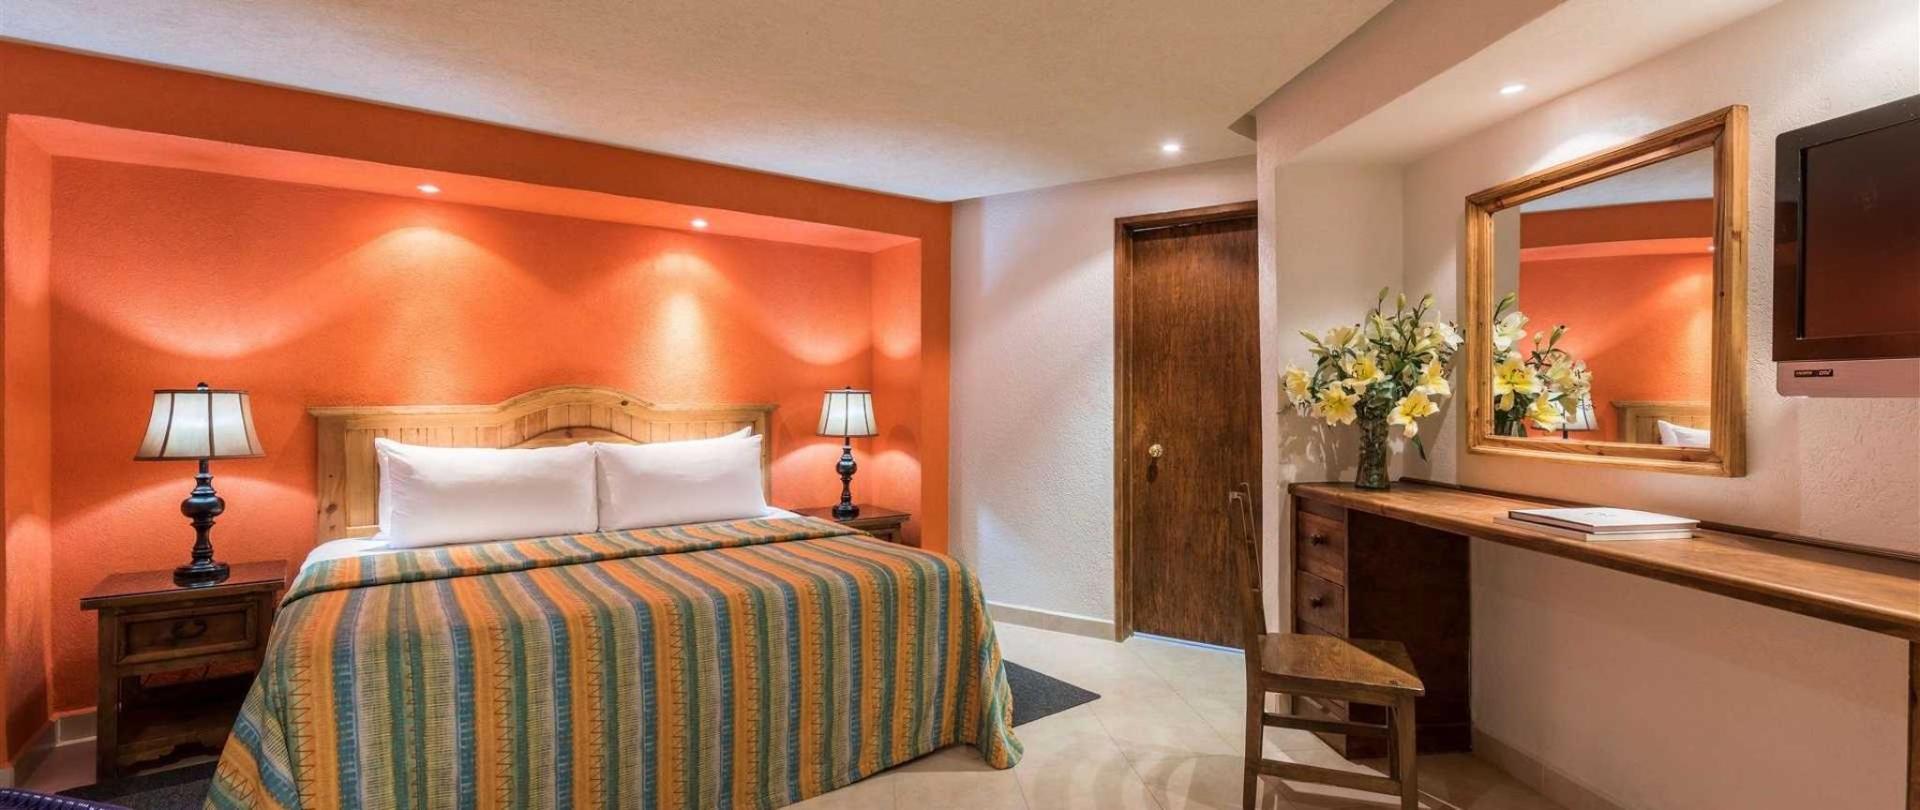 homepage-la-abadia-hotel-guanajuato-mexico1.jpeg